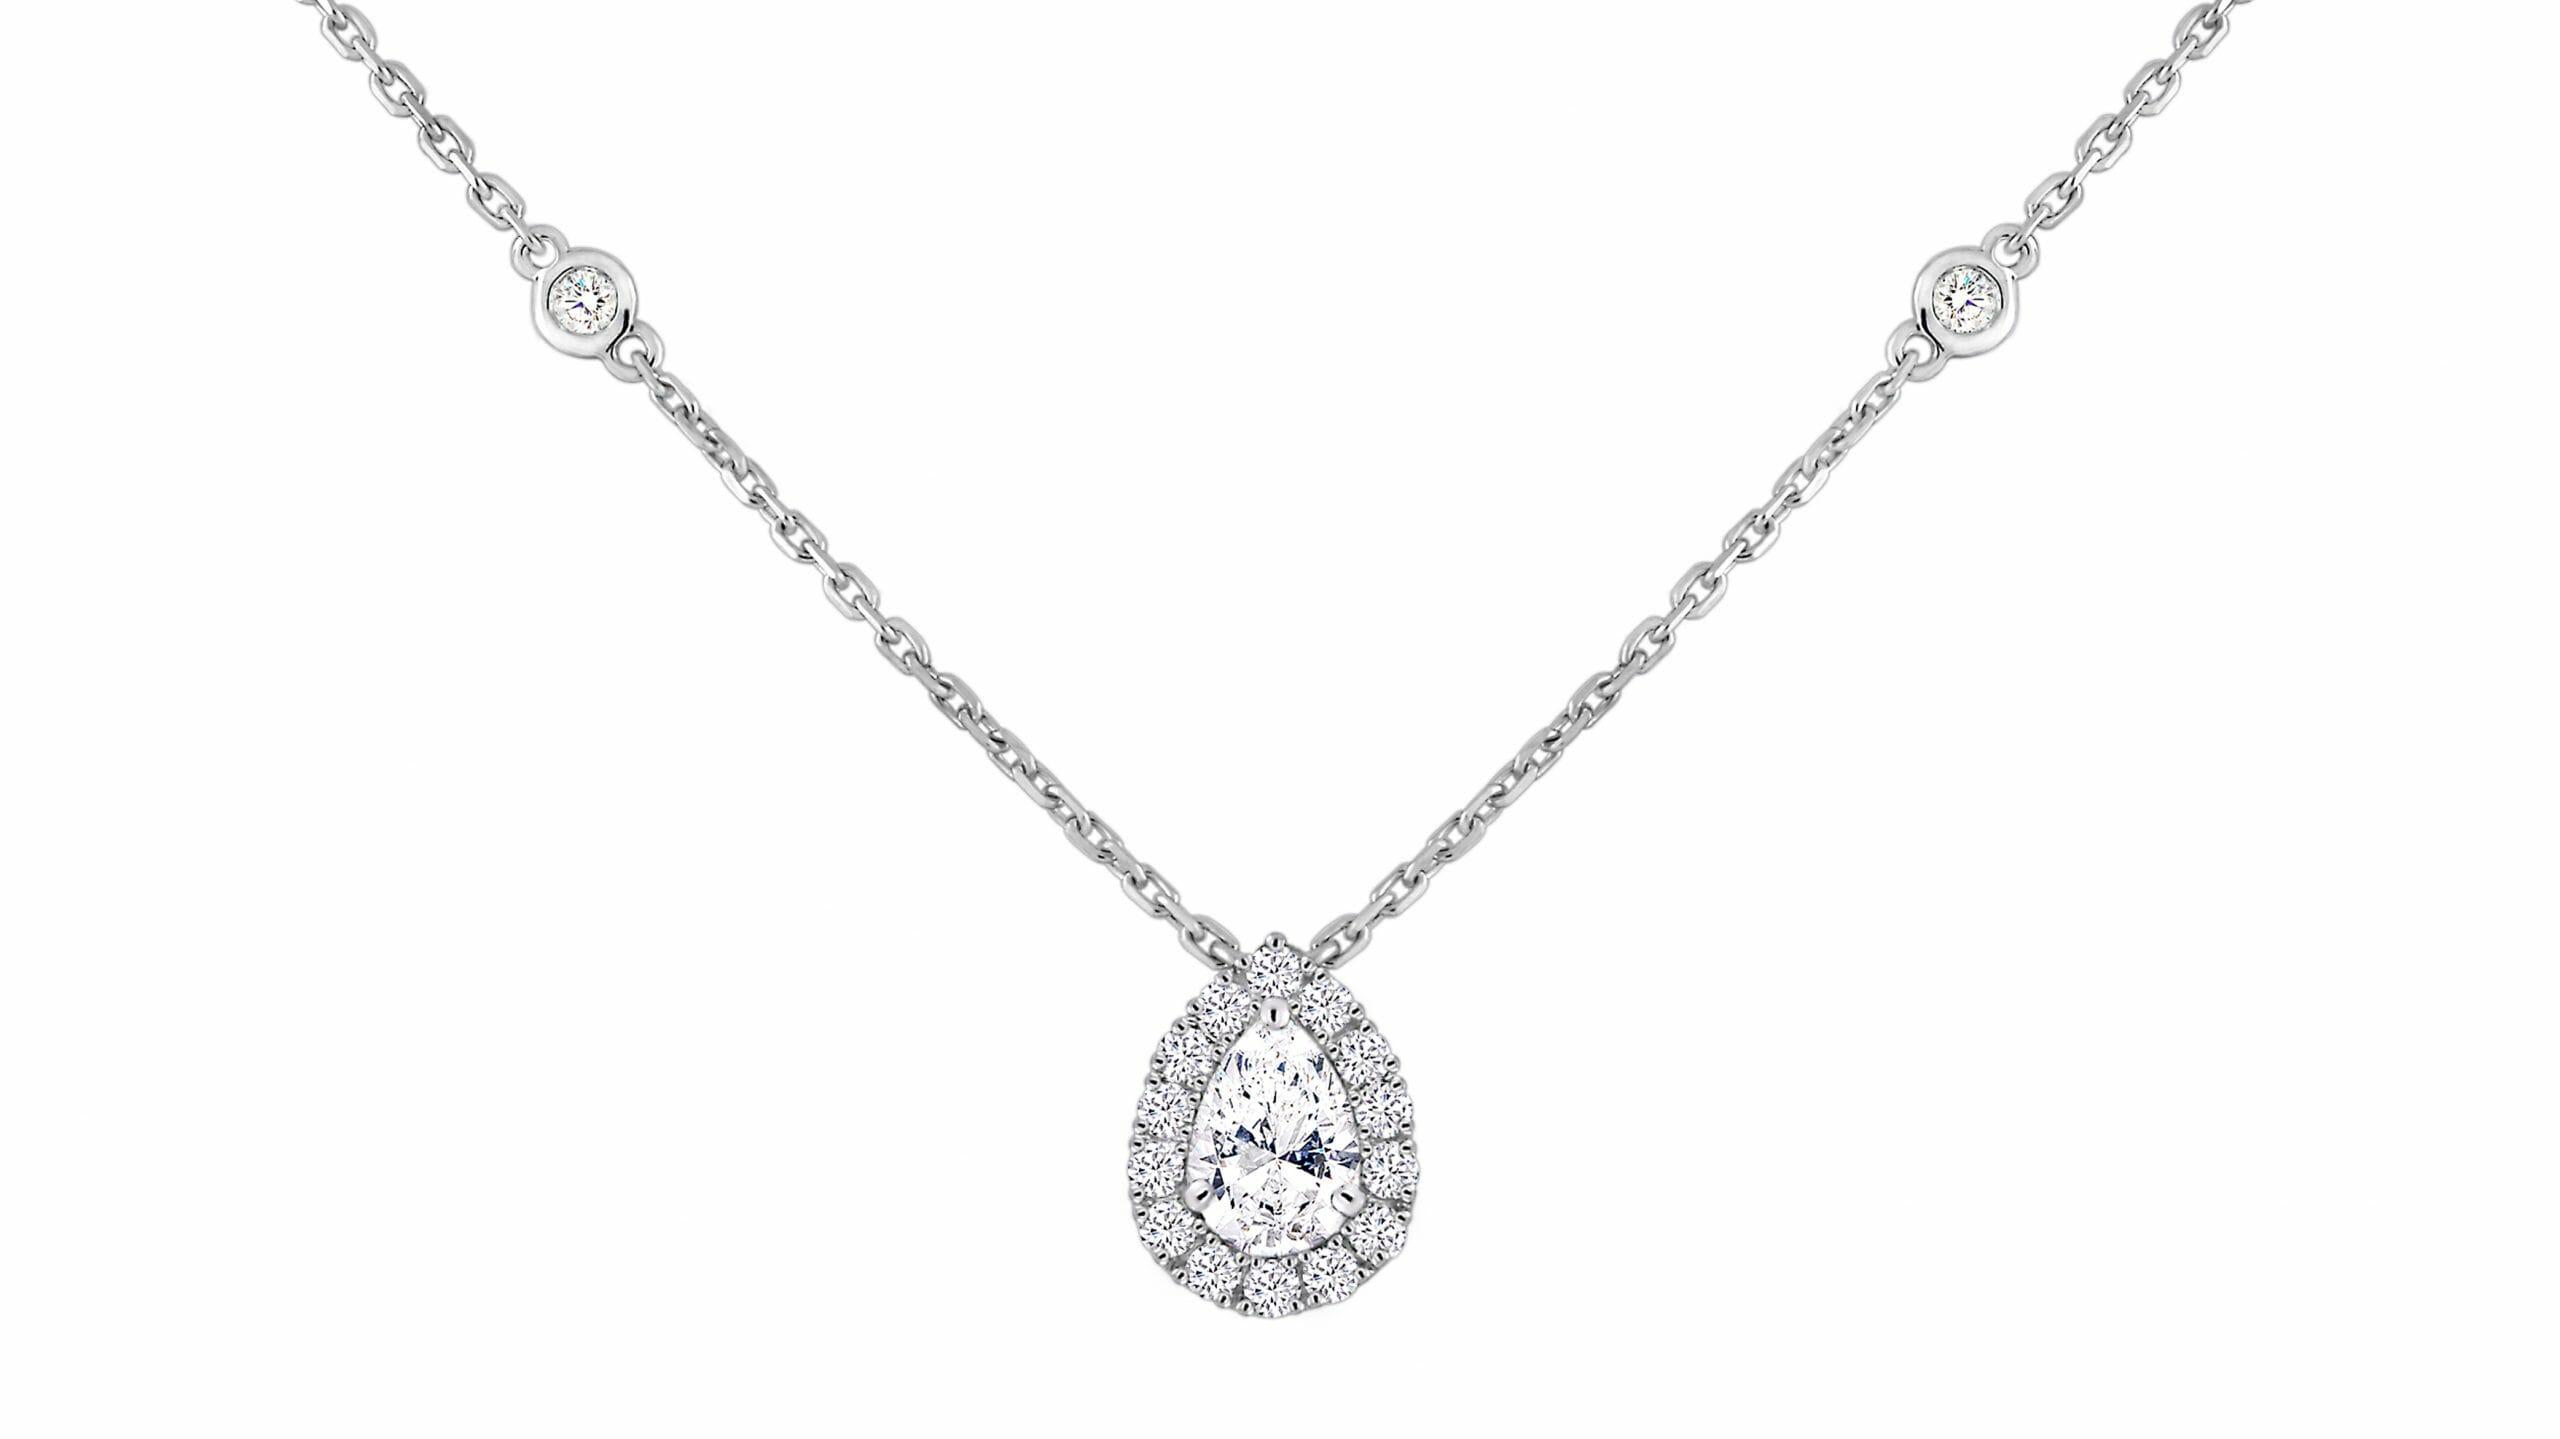 Diamond pendant | Pear diamond halo pendant set in 18 carat white gold